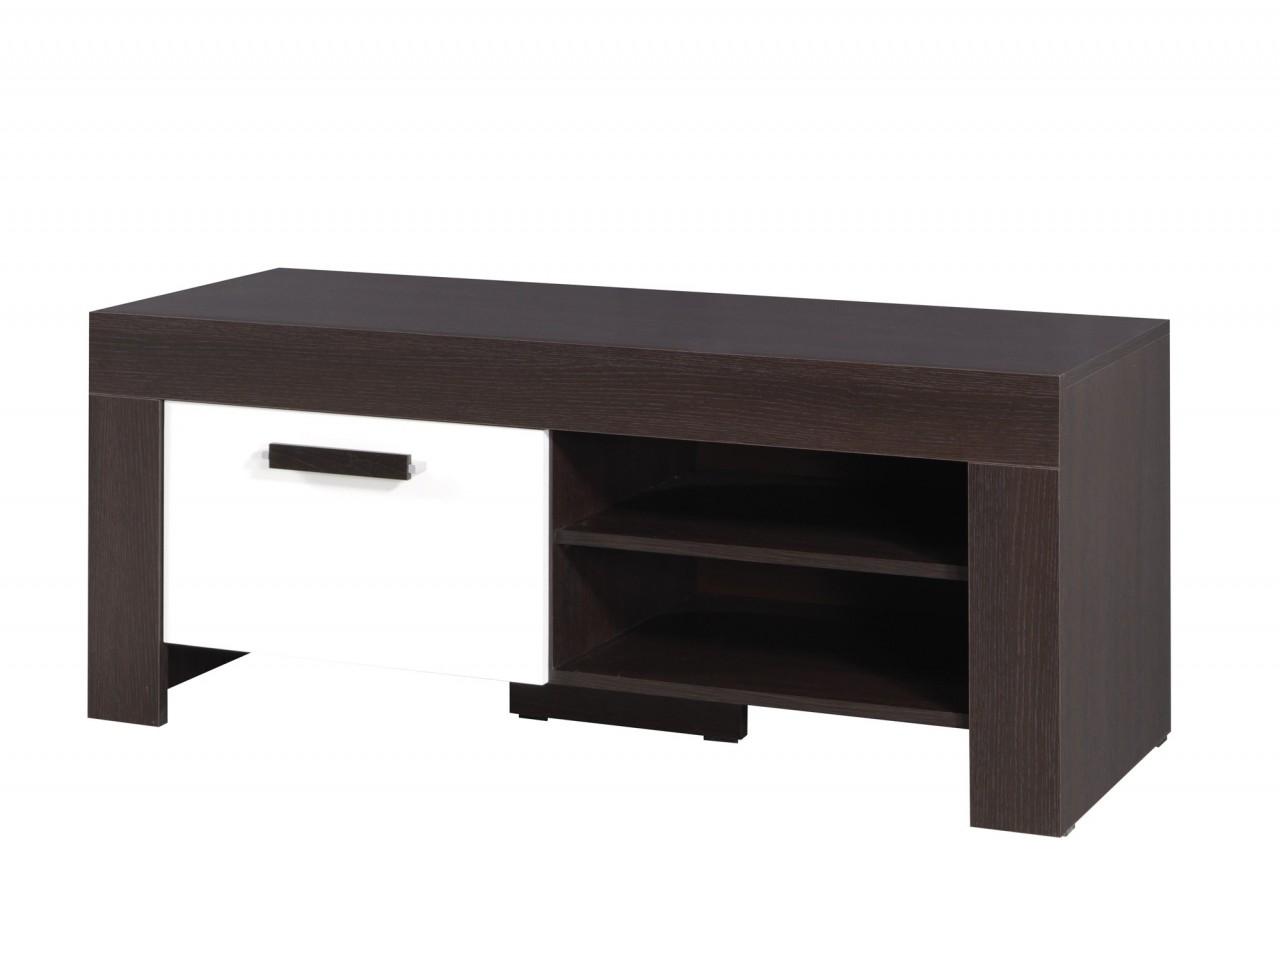 Sale Furniture CEZAR ambry Poland TV JUREK Meble TV commodes 15